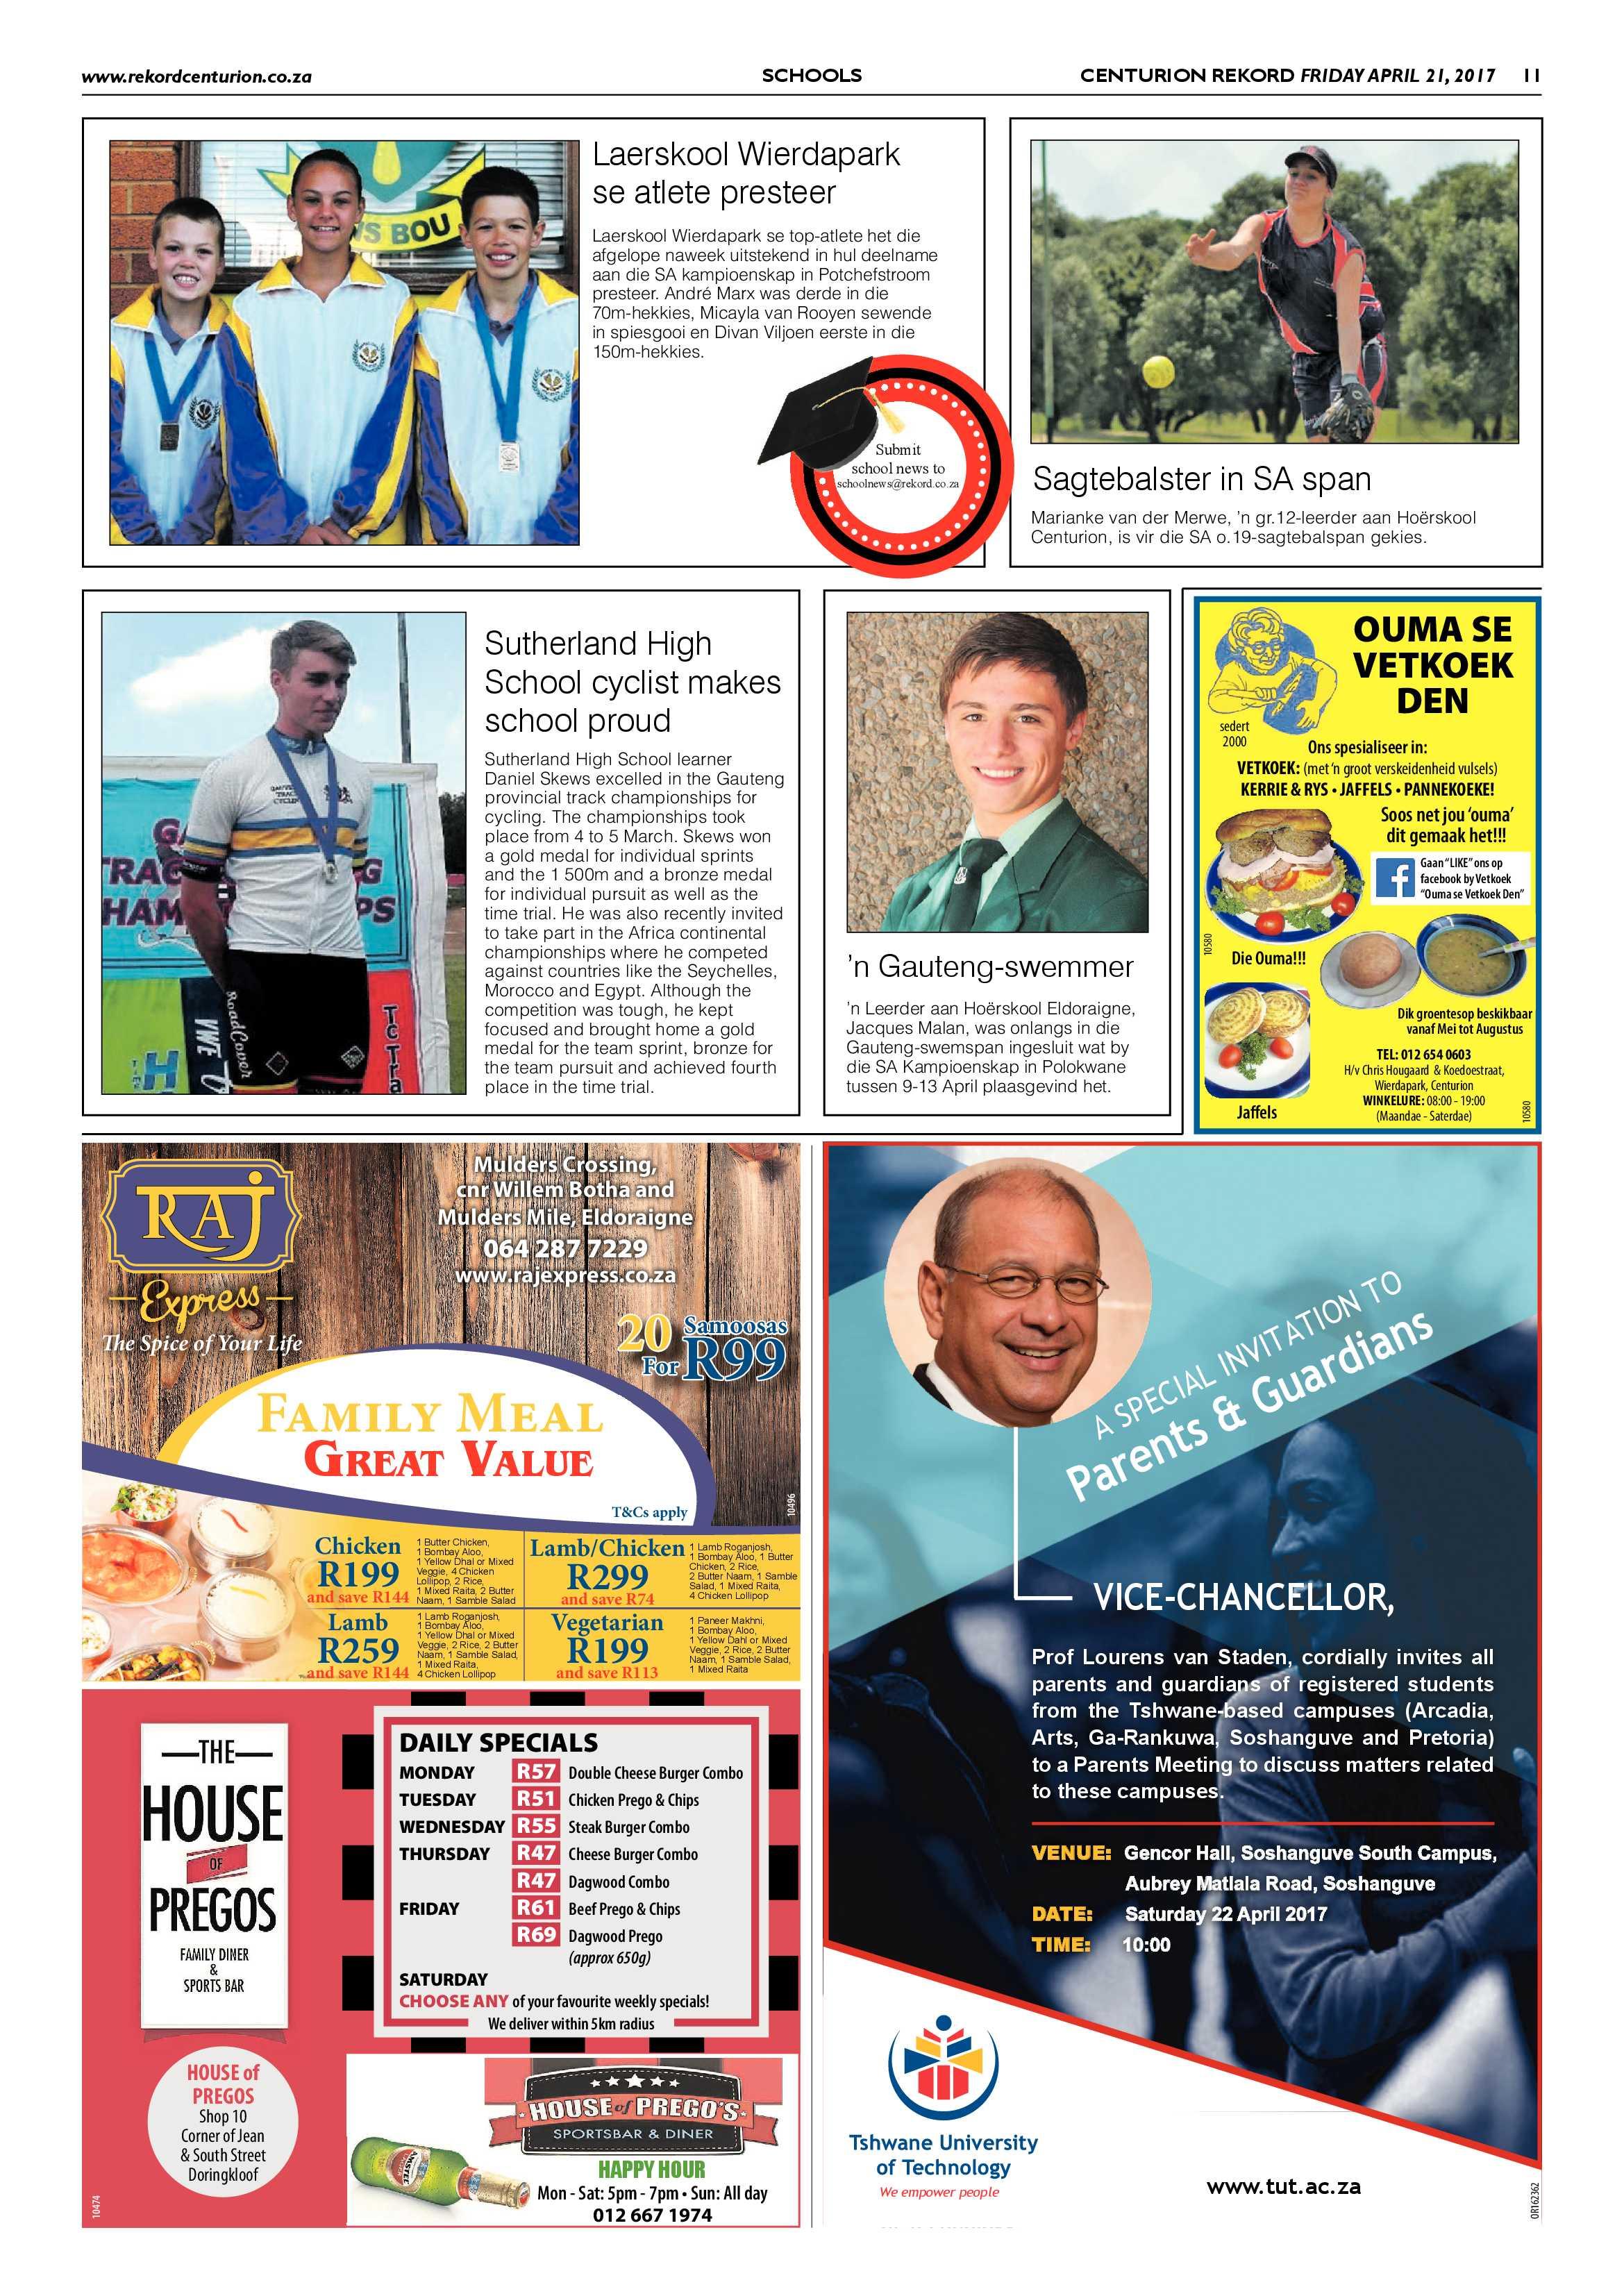 rekord-centurion-21-april-2017-epapers-page-11